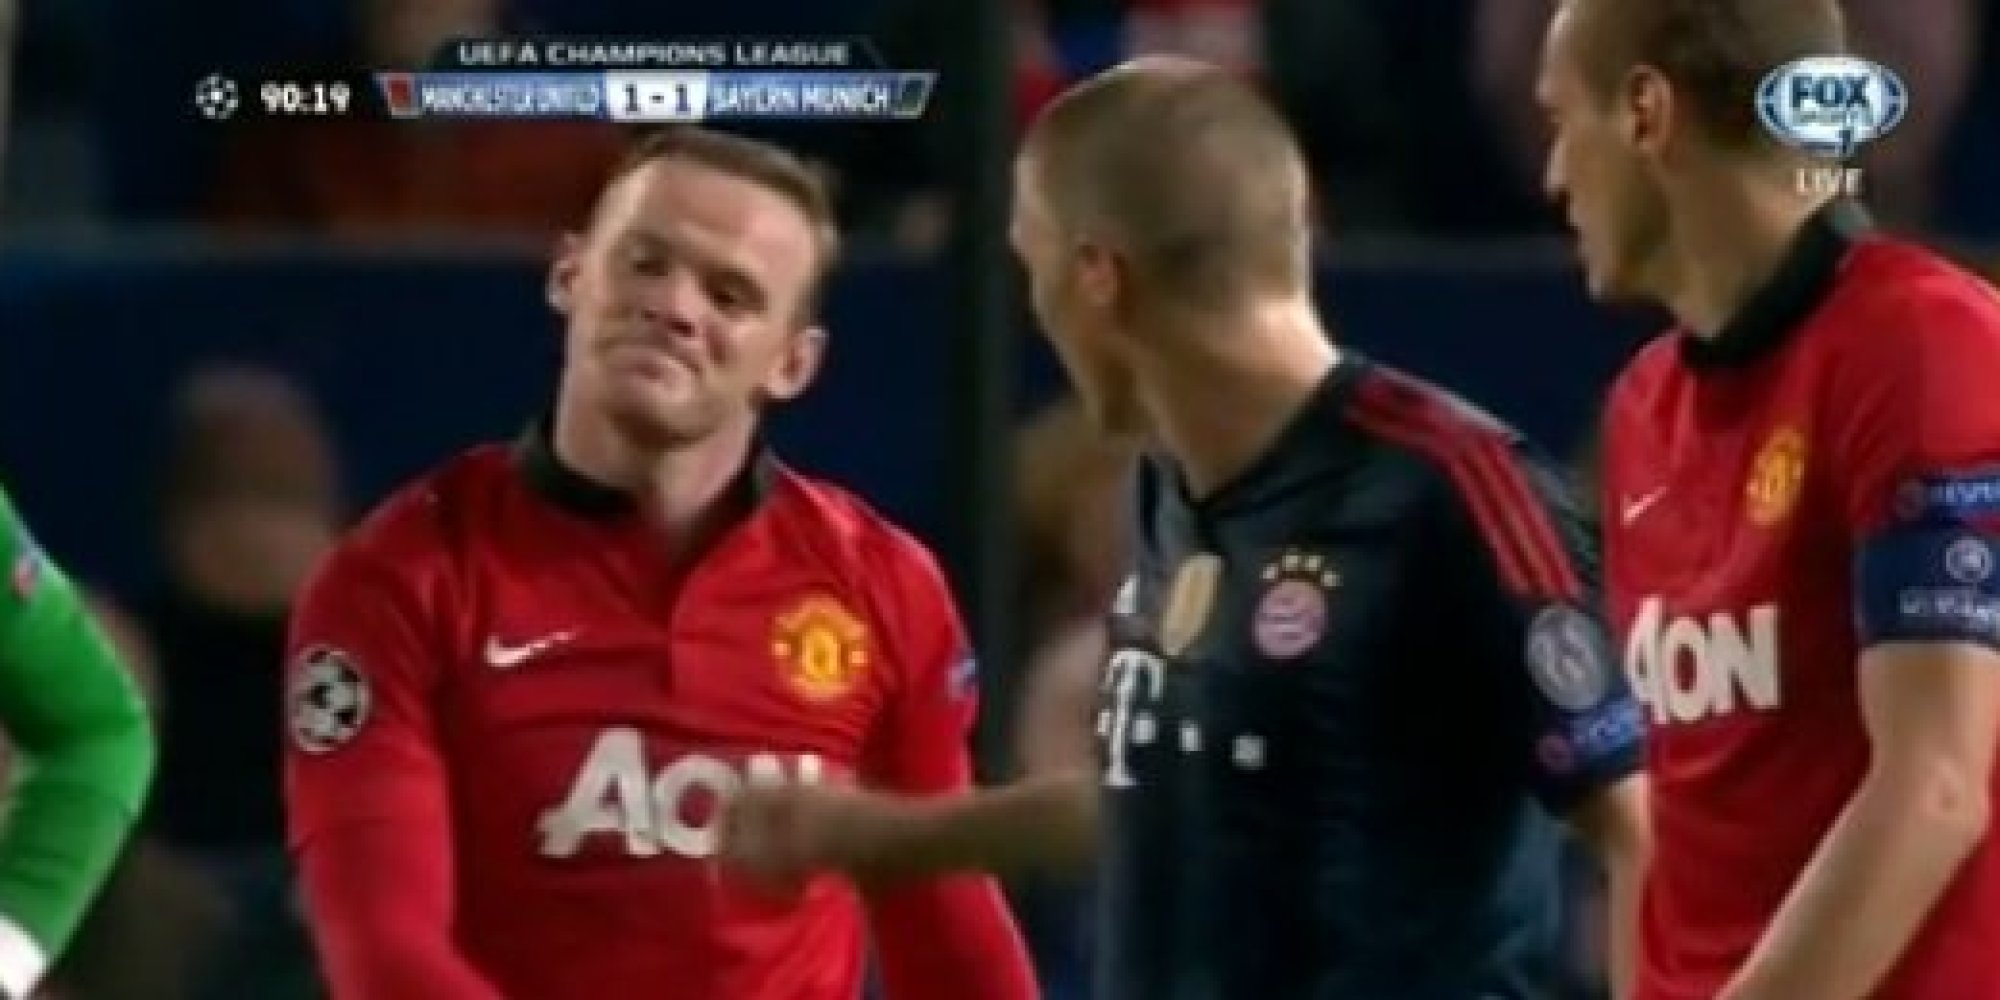 Kartu Merah Schweinsteiger, Ini Komentar Rooney